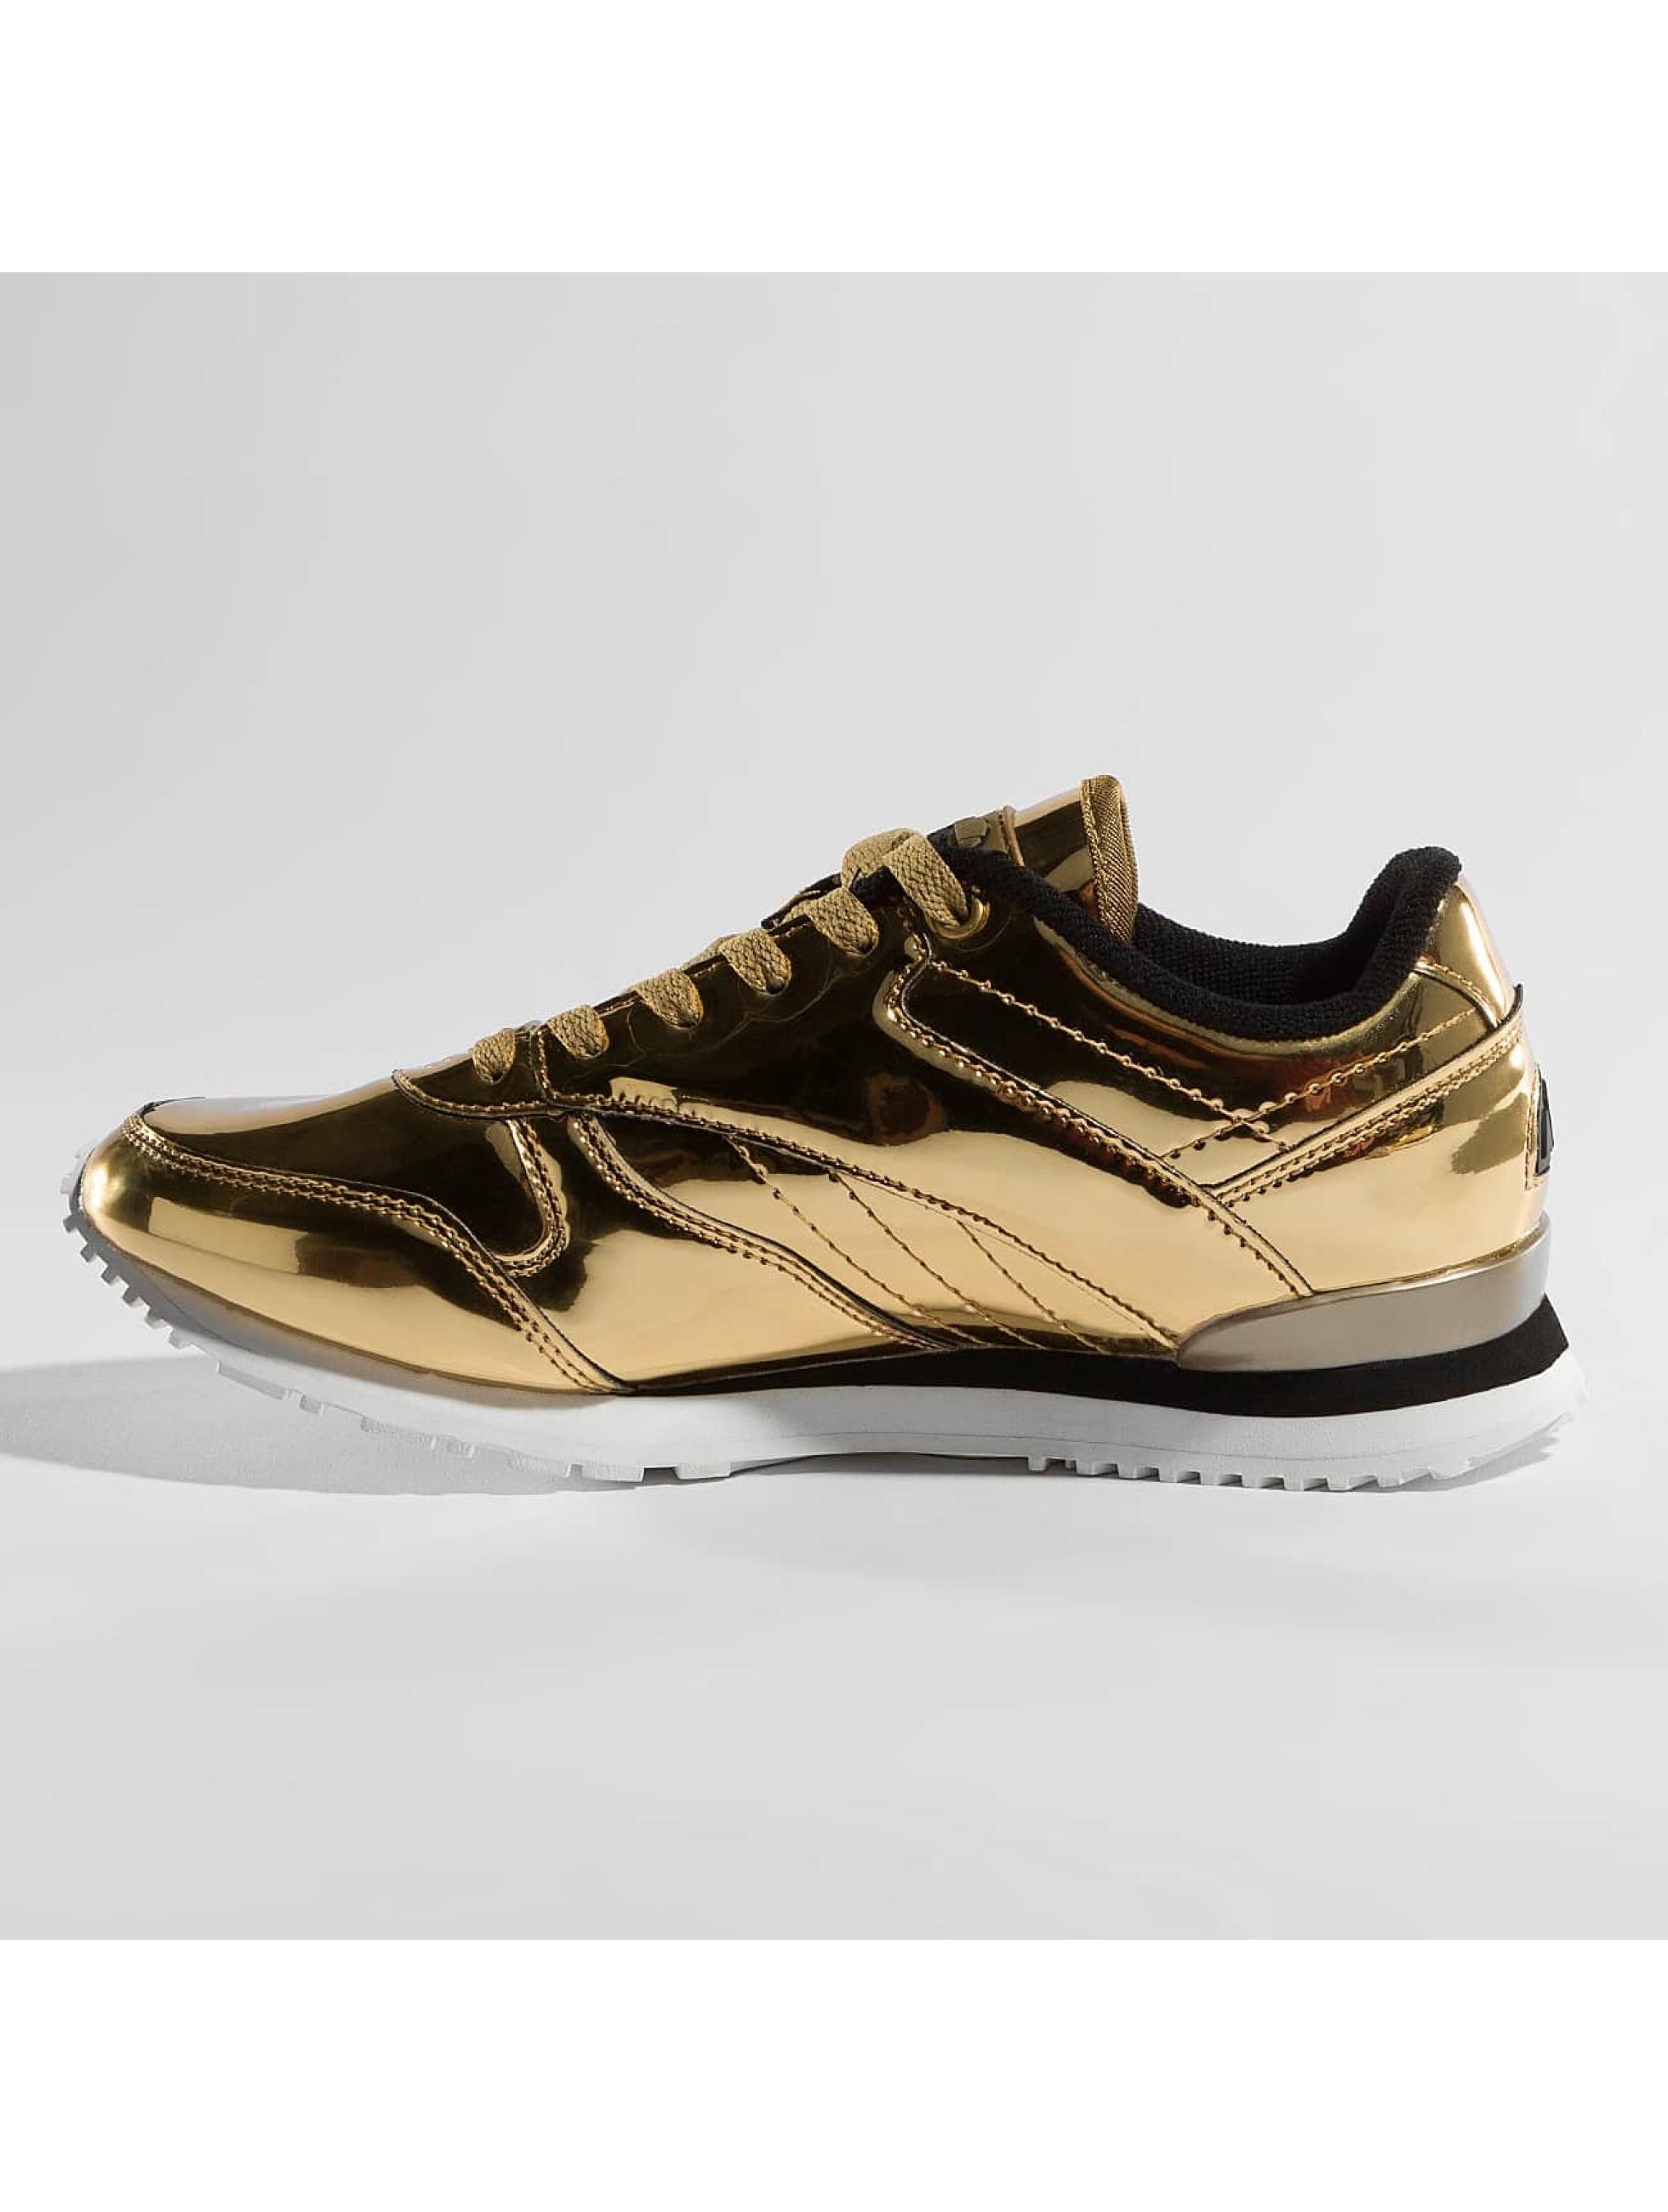 Ellesse Sneakers Heritage City Runner Metallic Runner gold colored